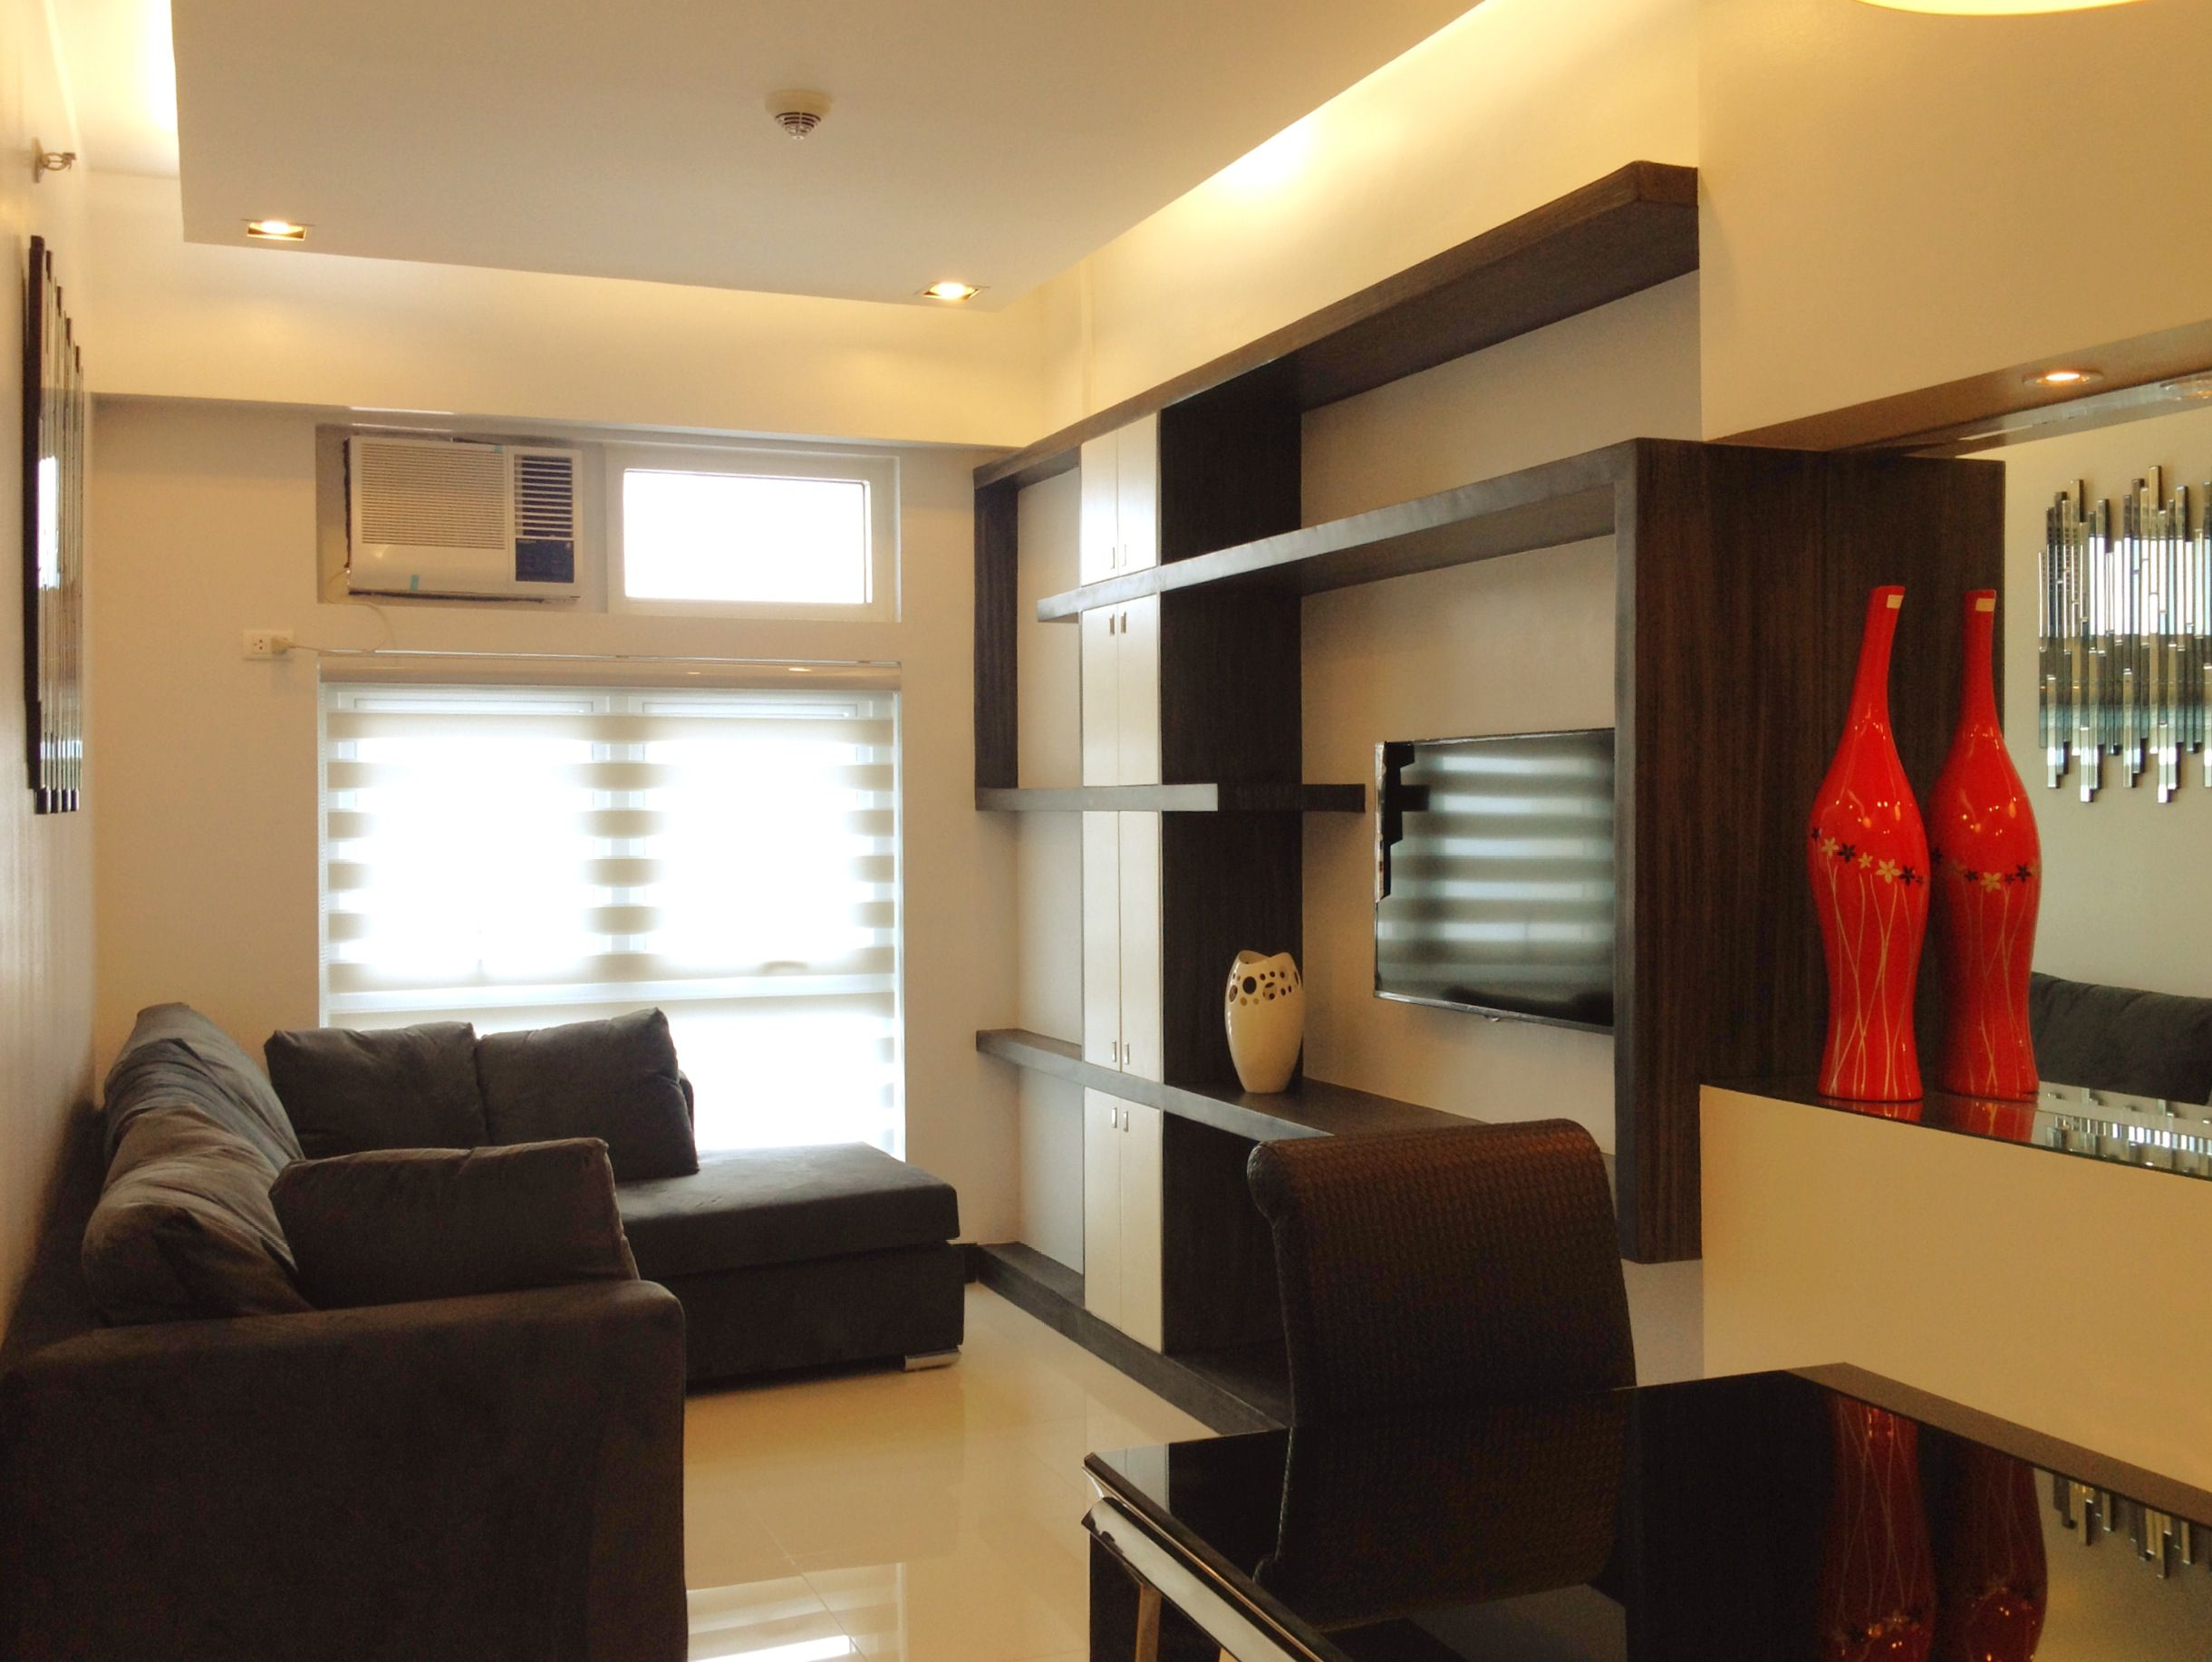 40sqm Condo Unit Condo Interior Design Living Room Design S